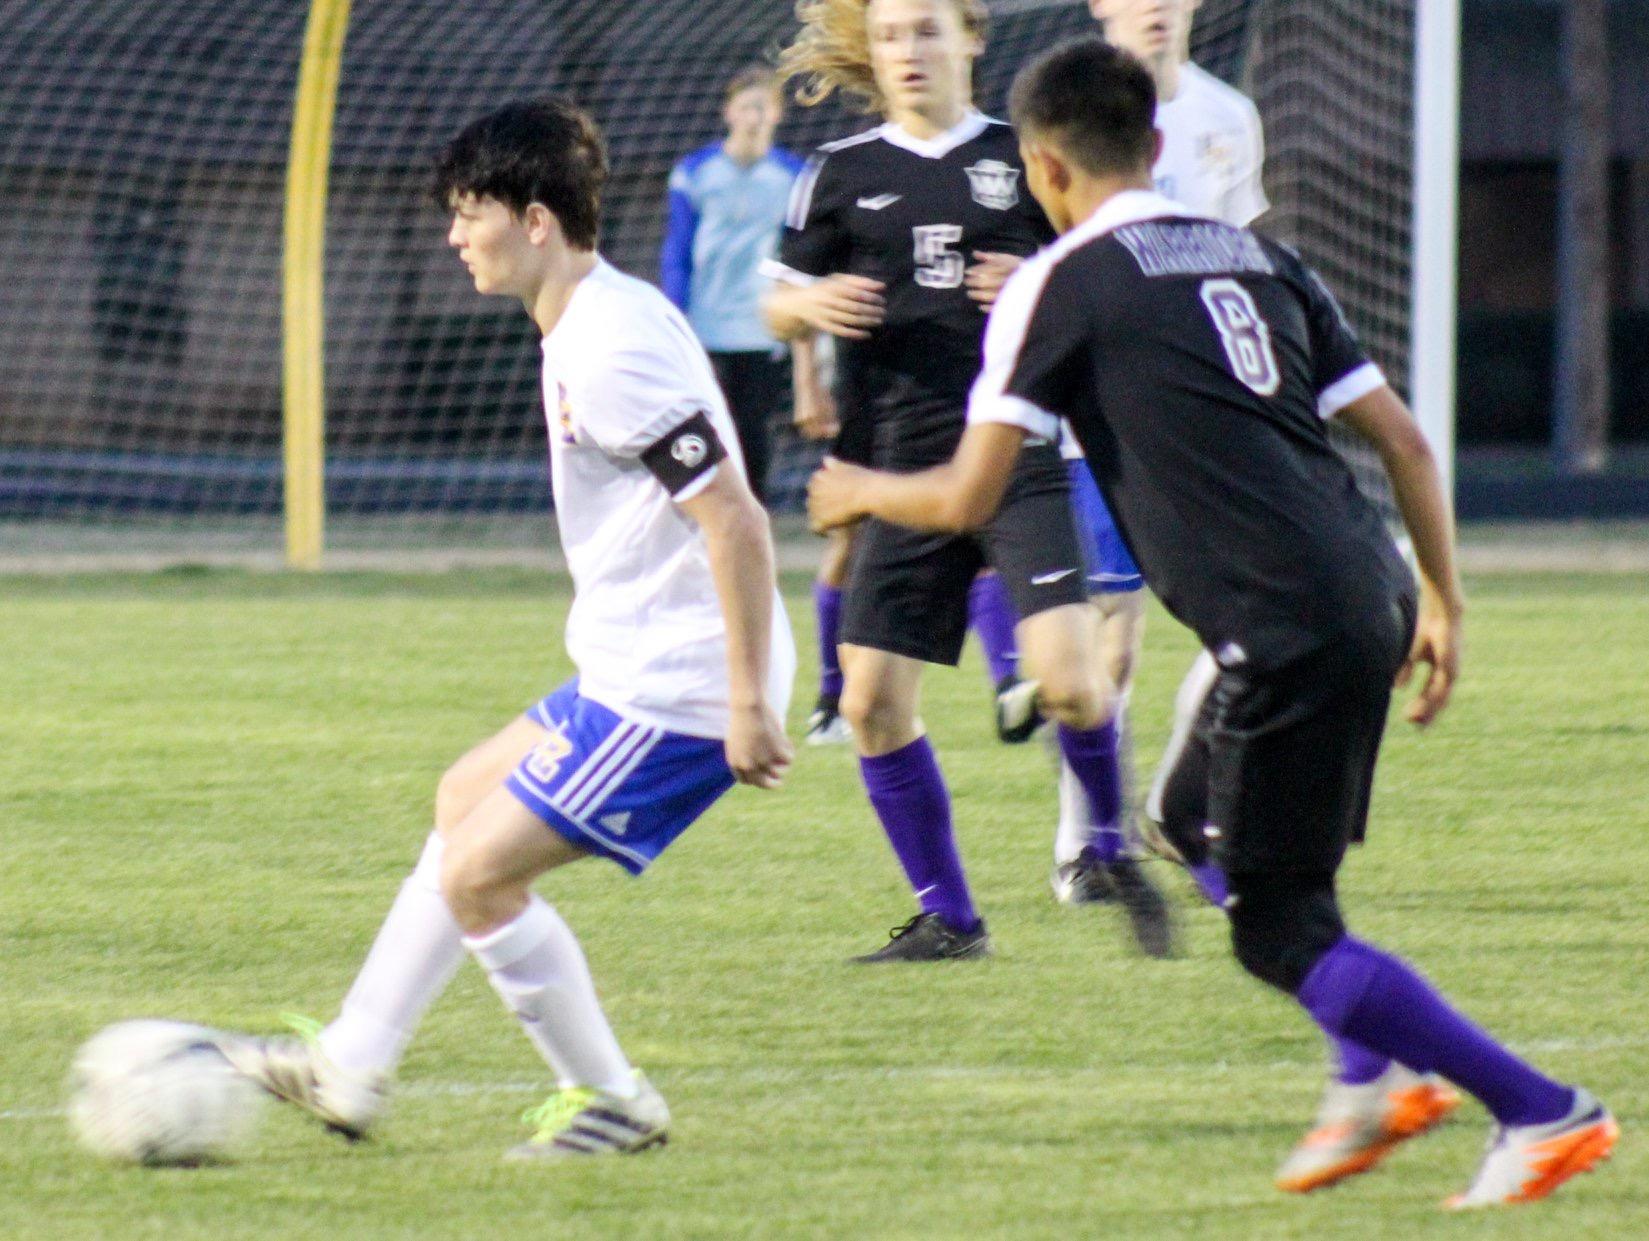 Matthew Meredith sets up a kick